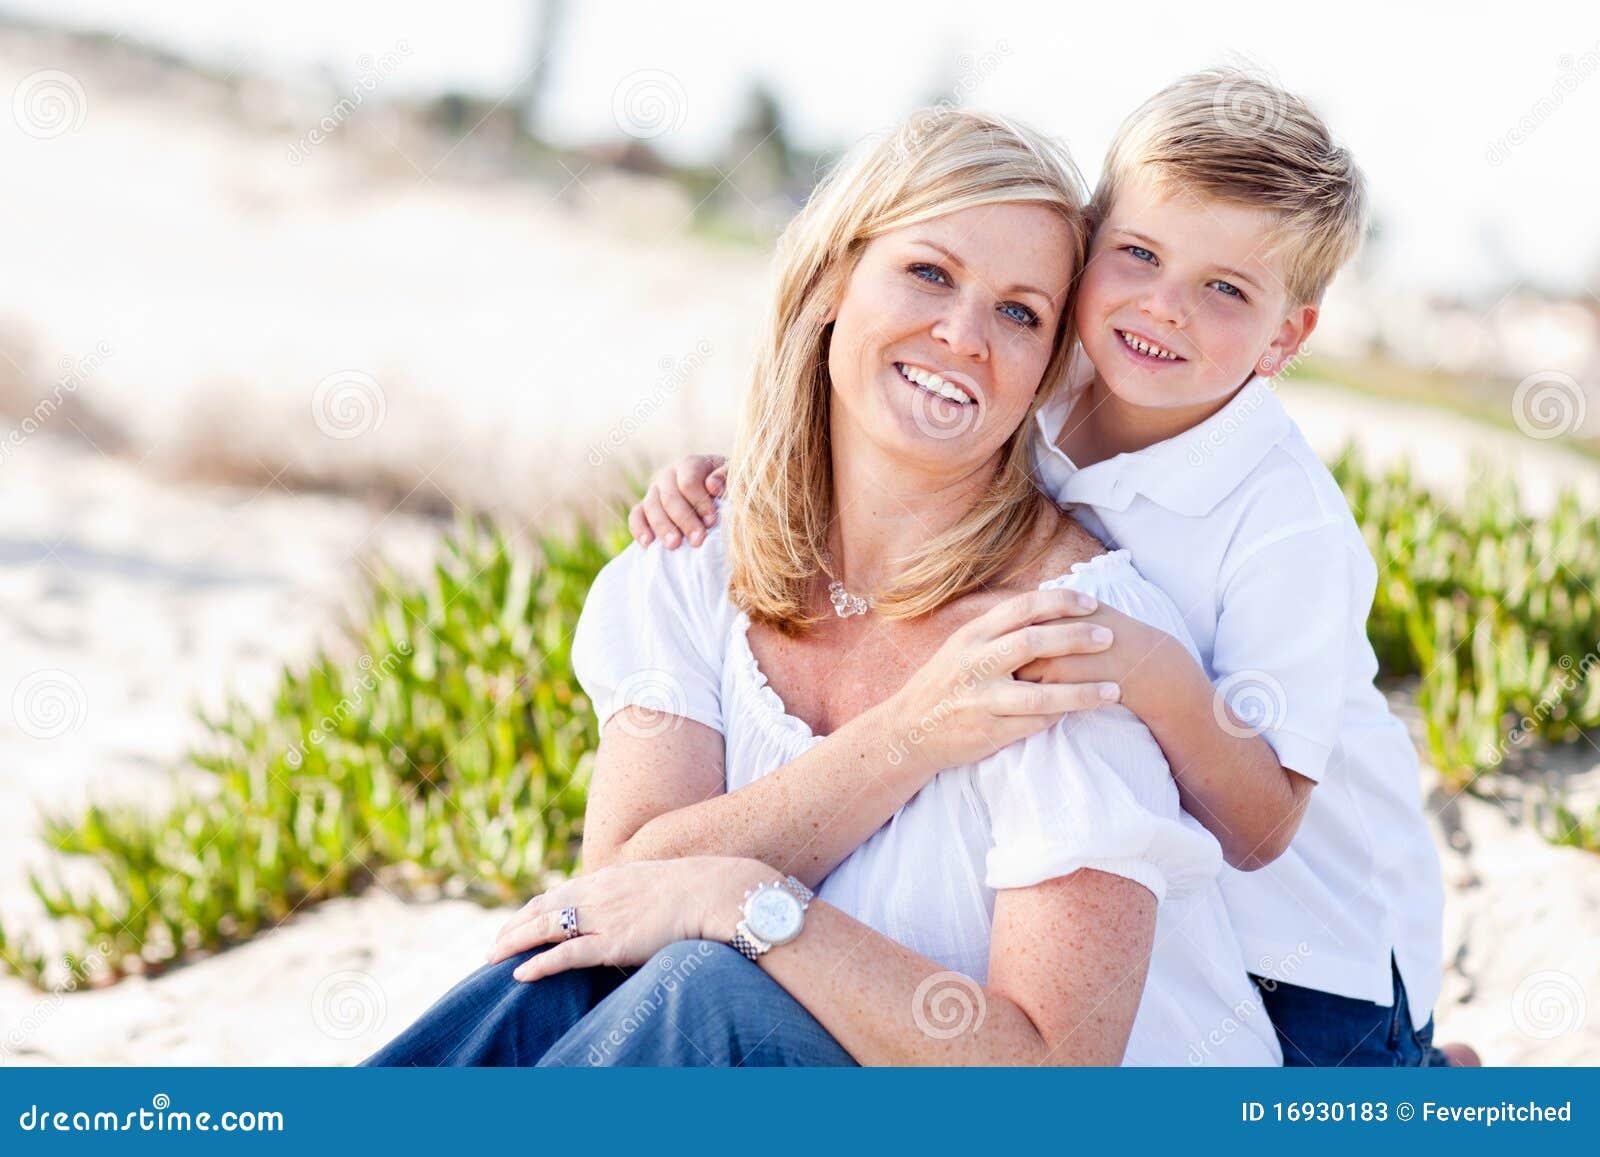 Син и мама сех 13 фотография